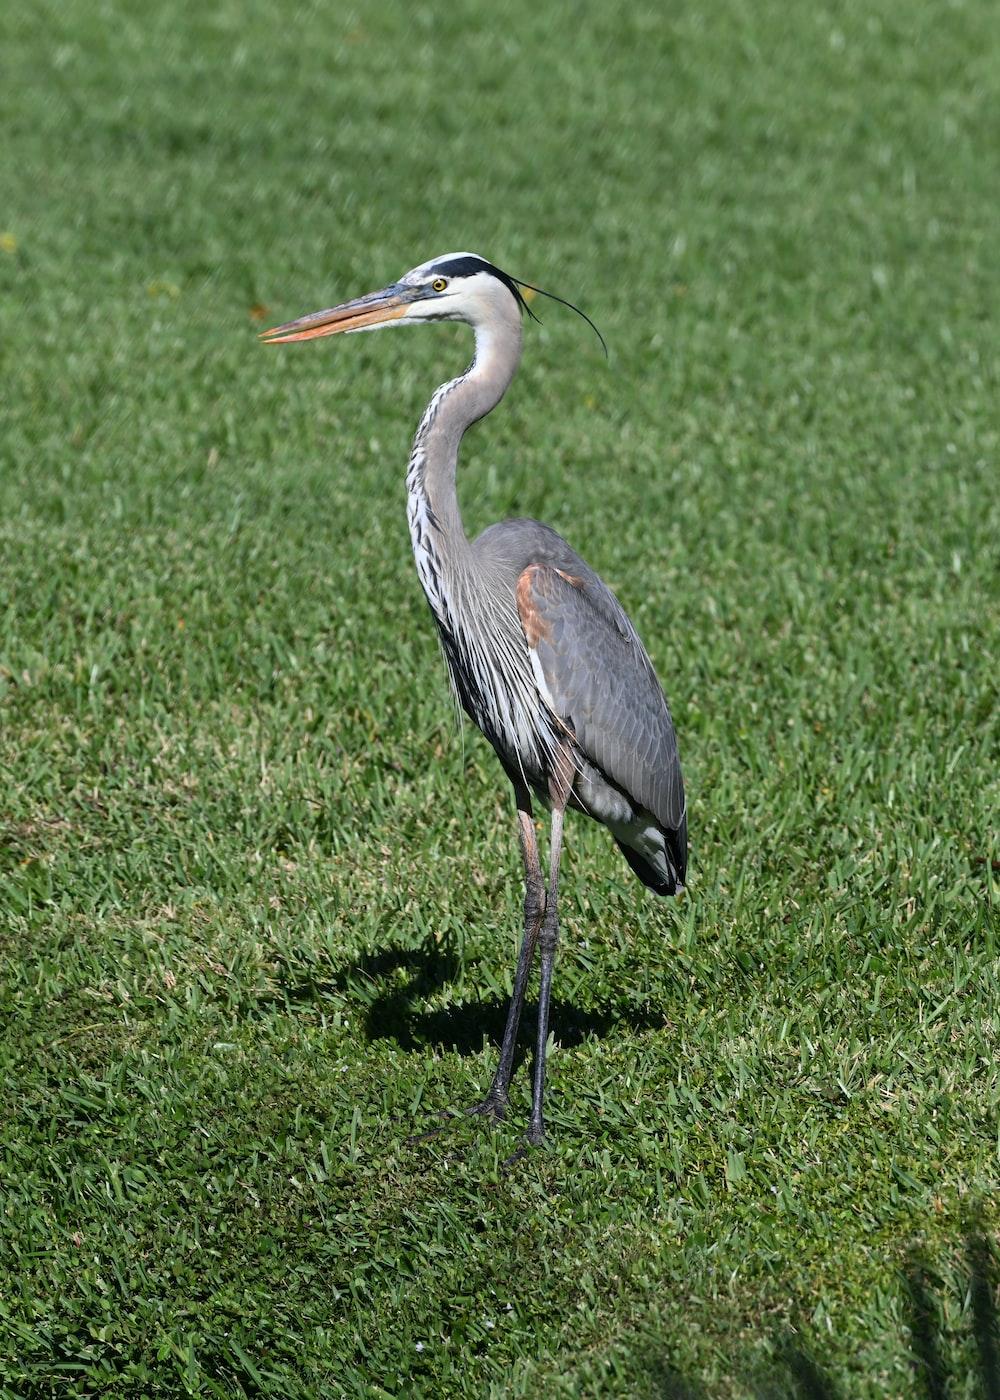 gray bird on green grass field during daytime